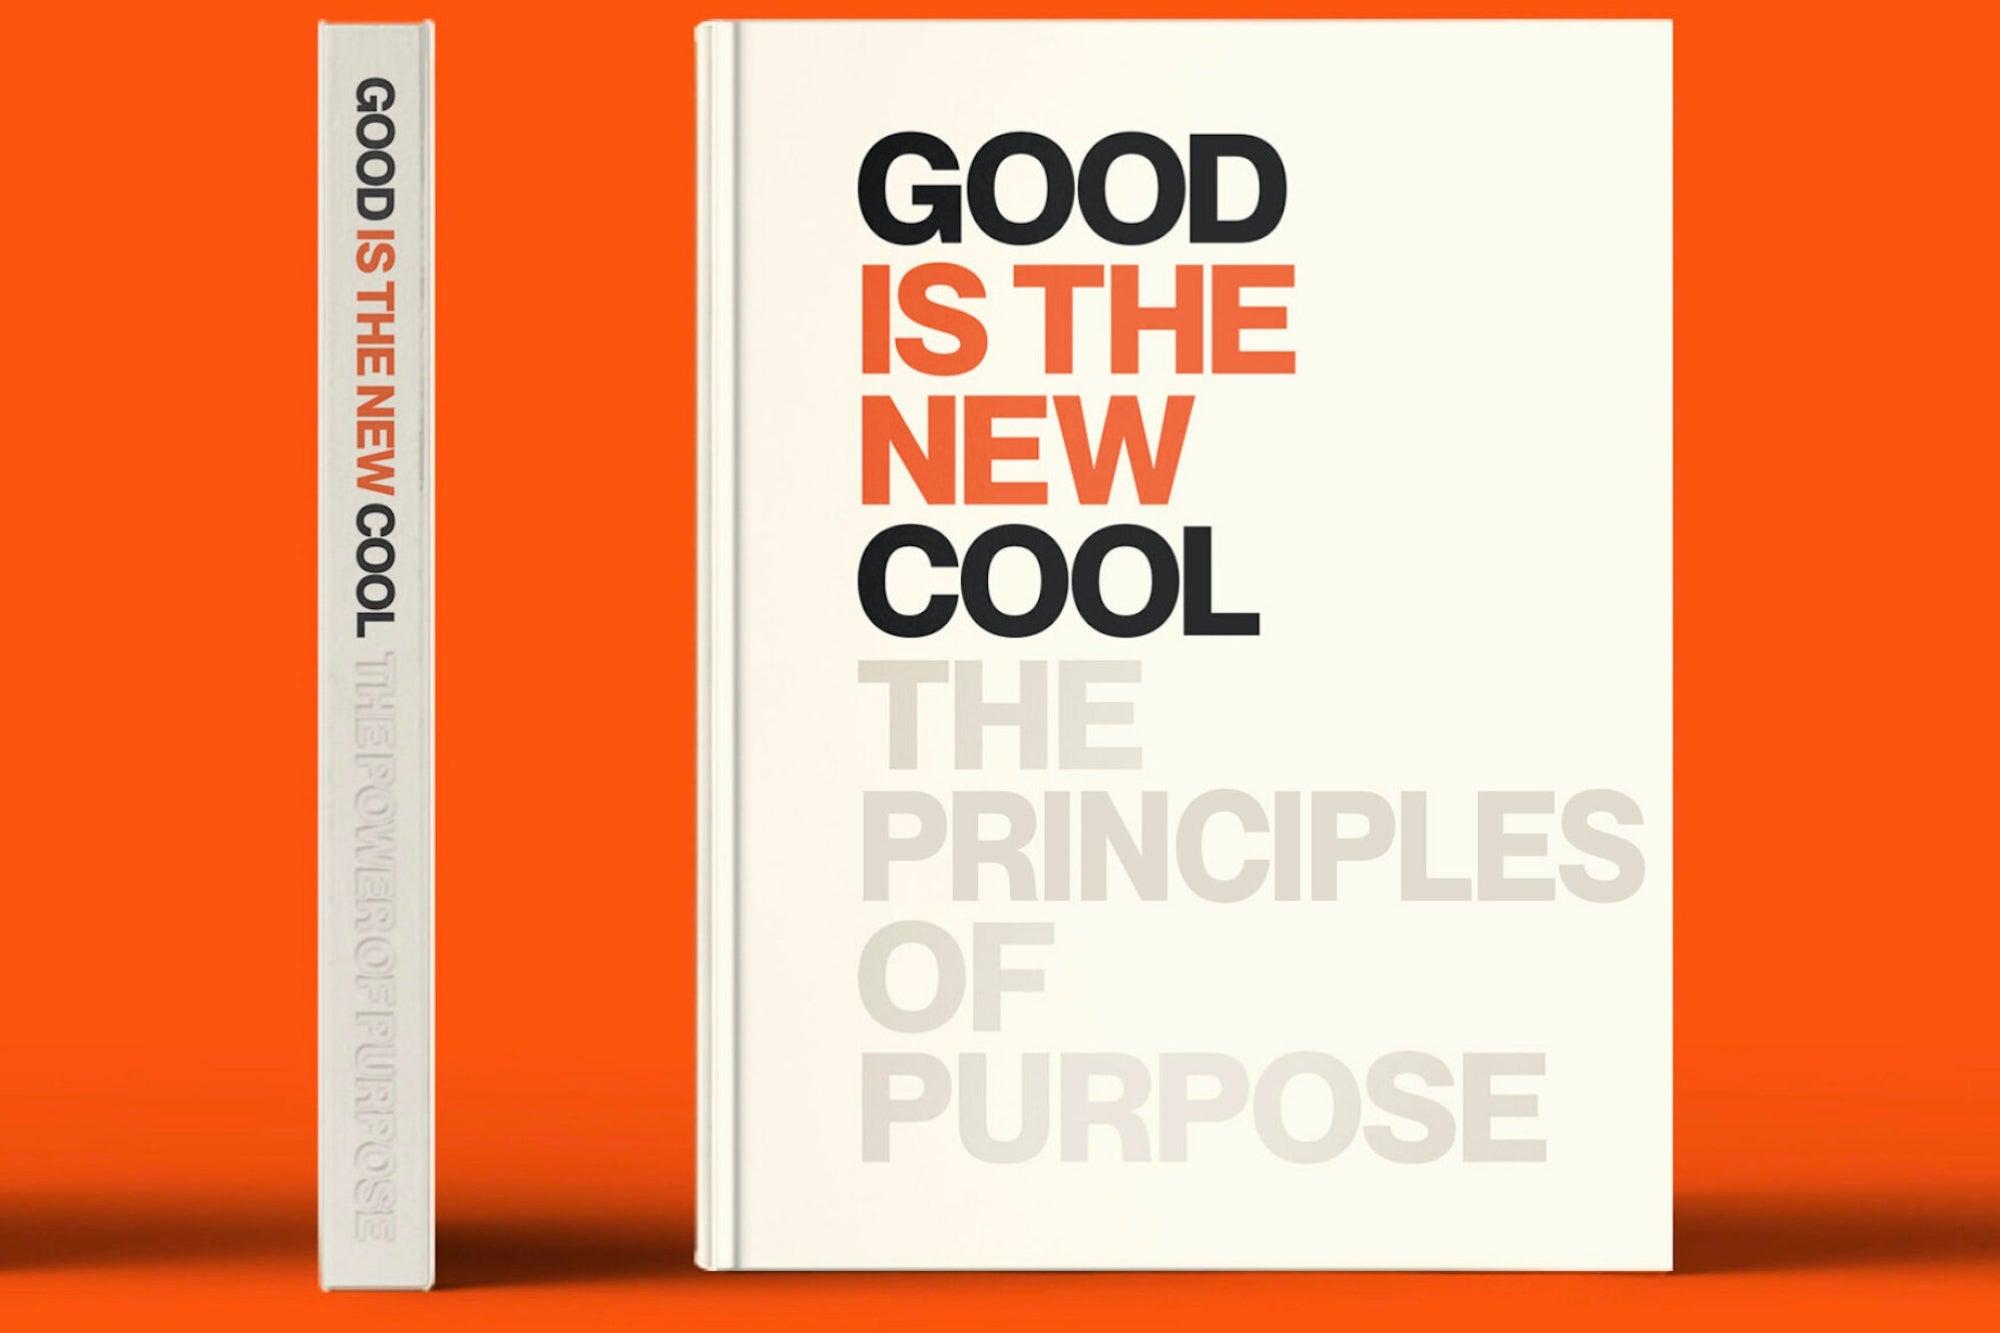 3 Ways to Become a Purpose-Driven Company